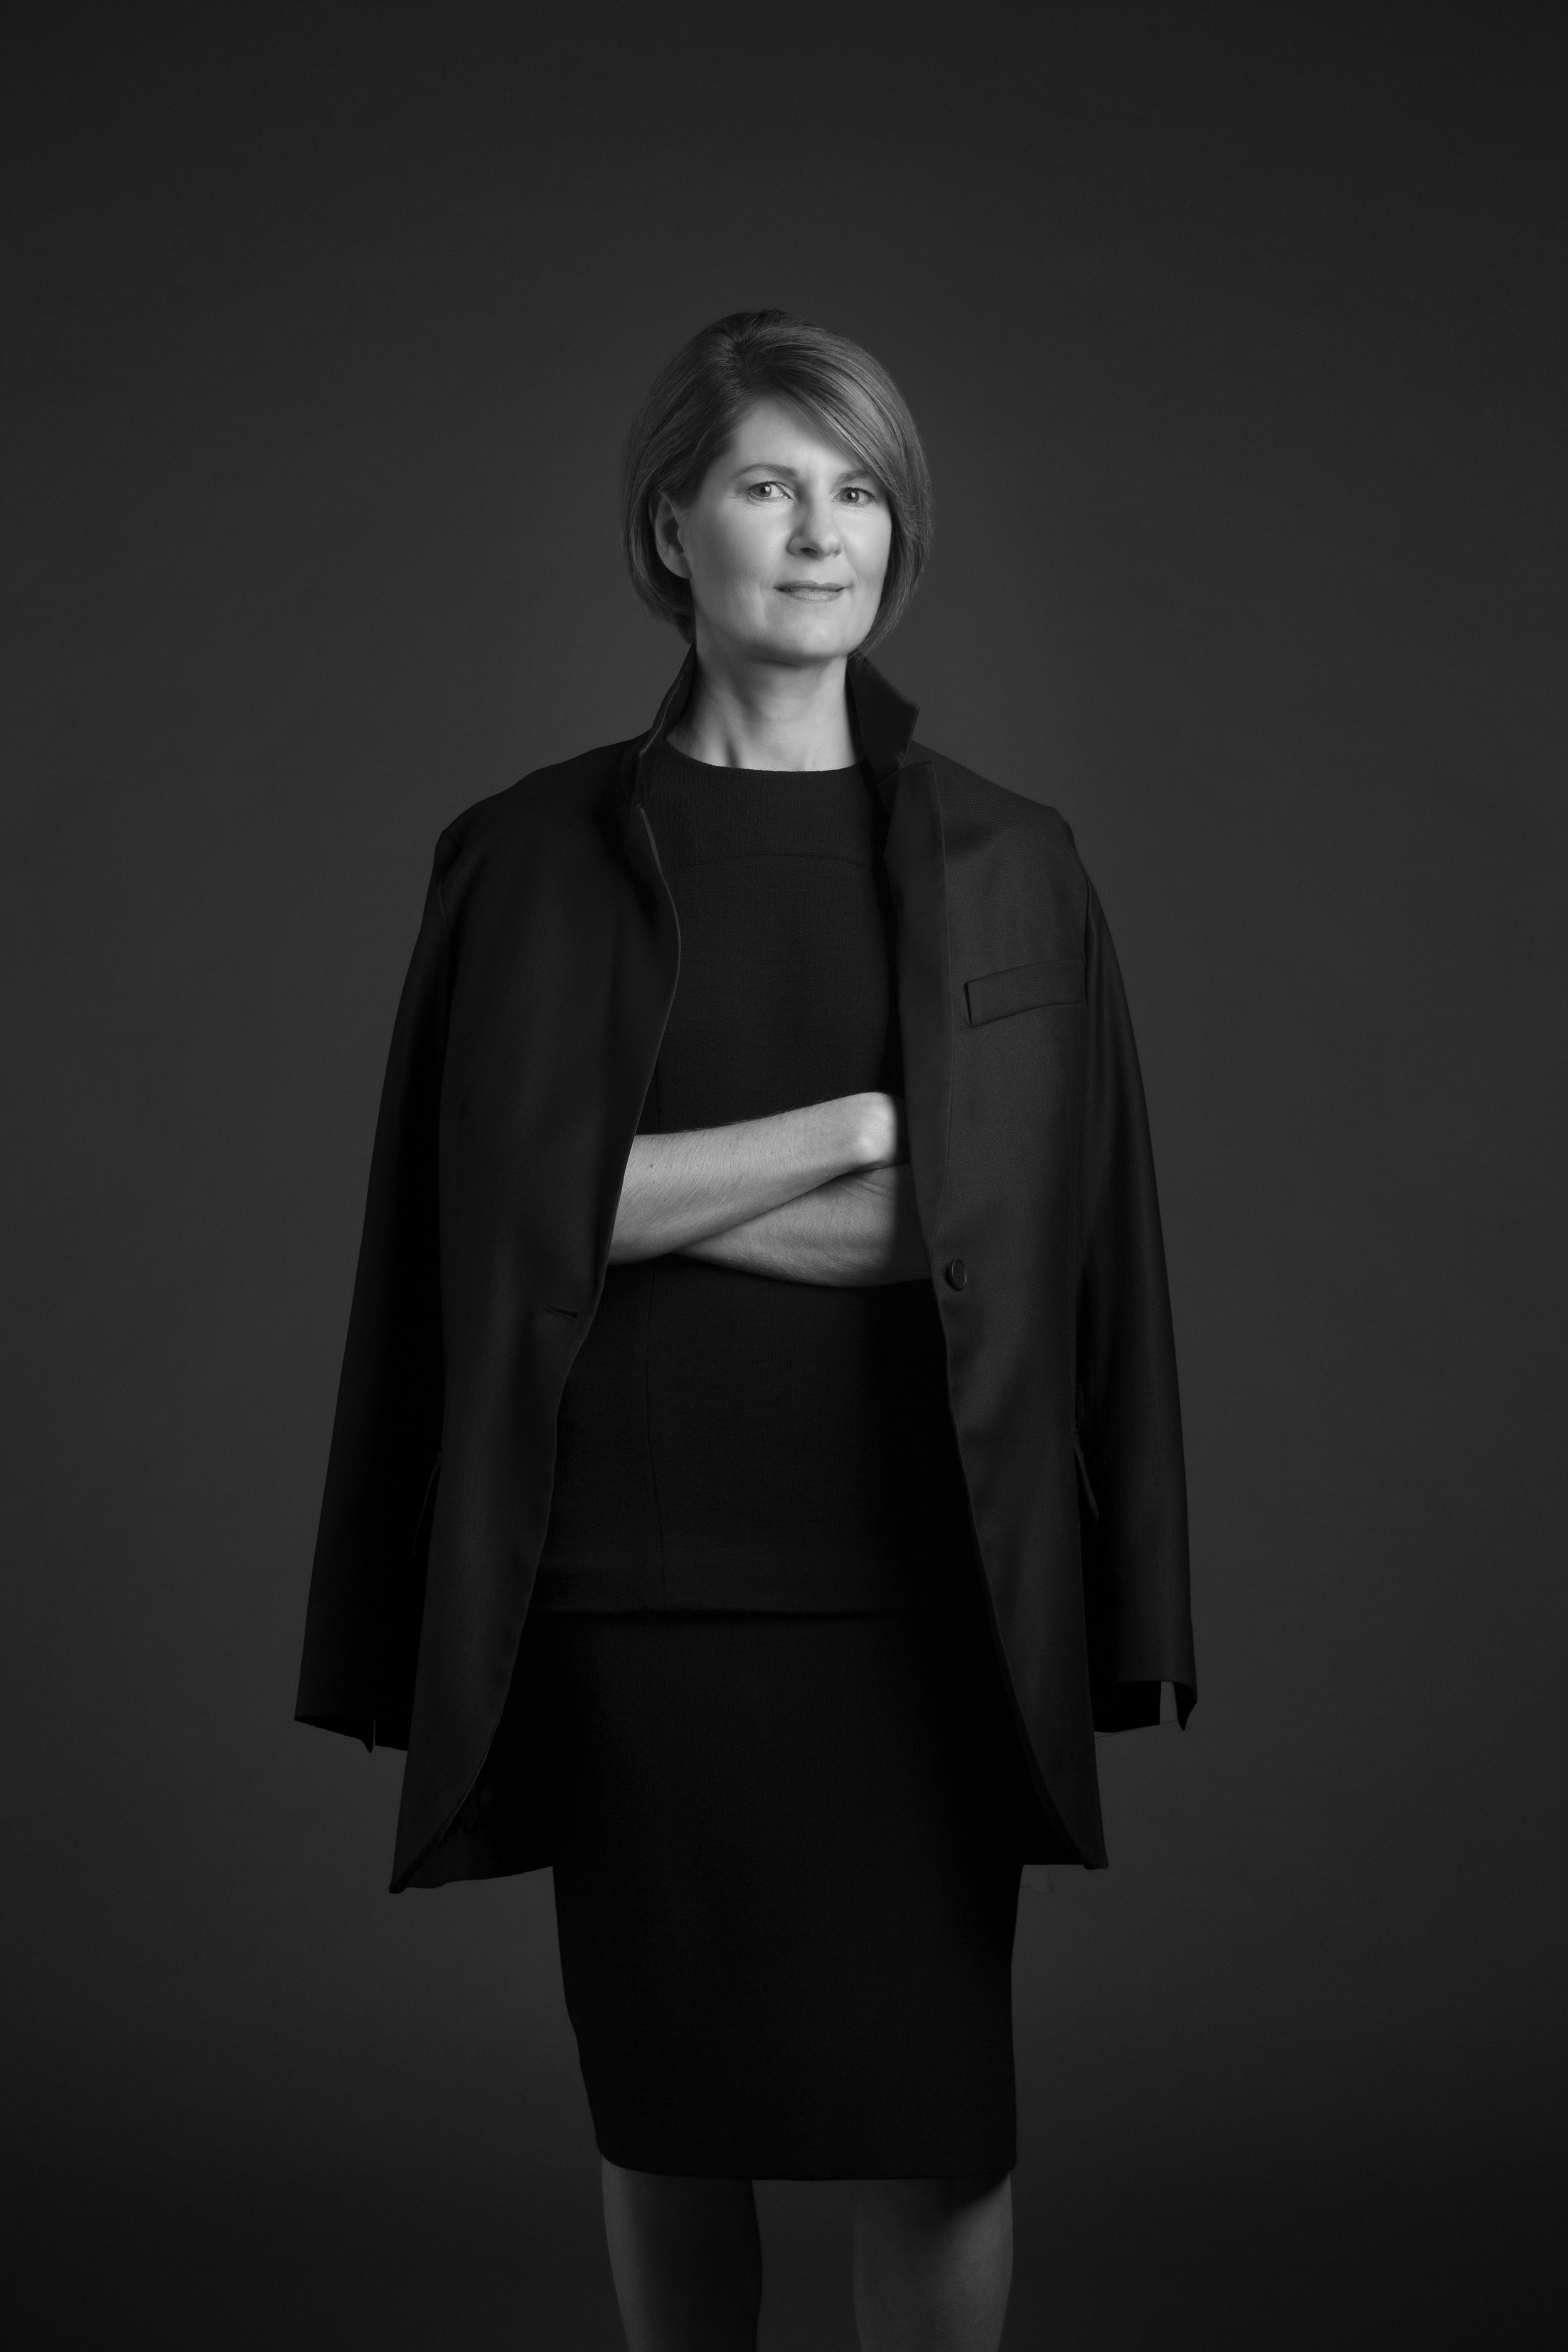 Wendy Doyle, Women's Foundation President & CEO